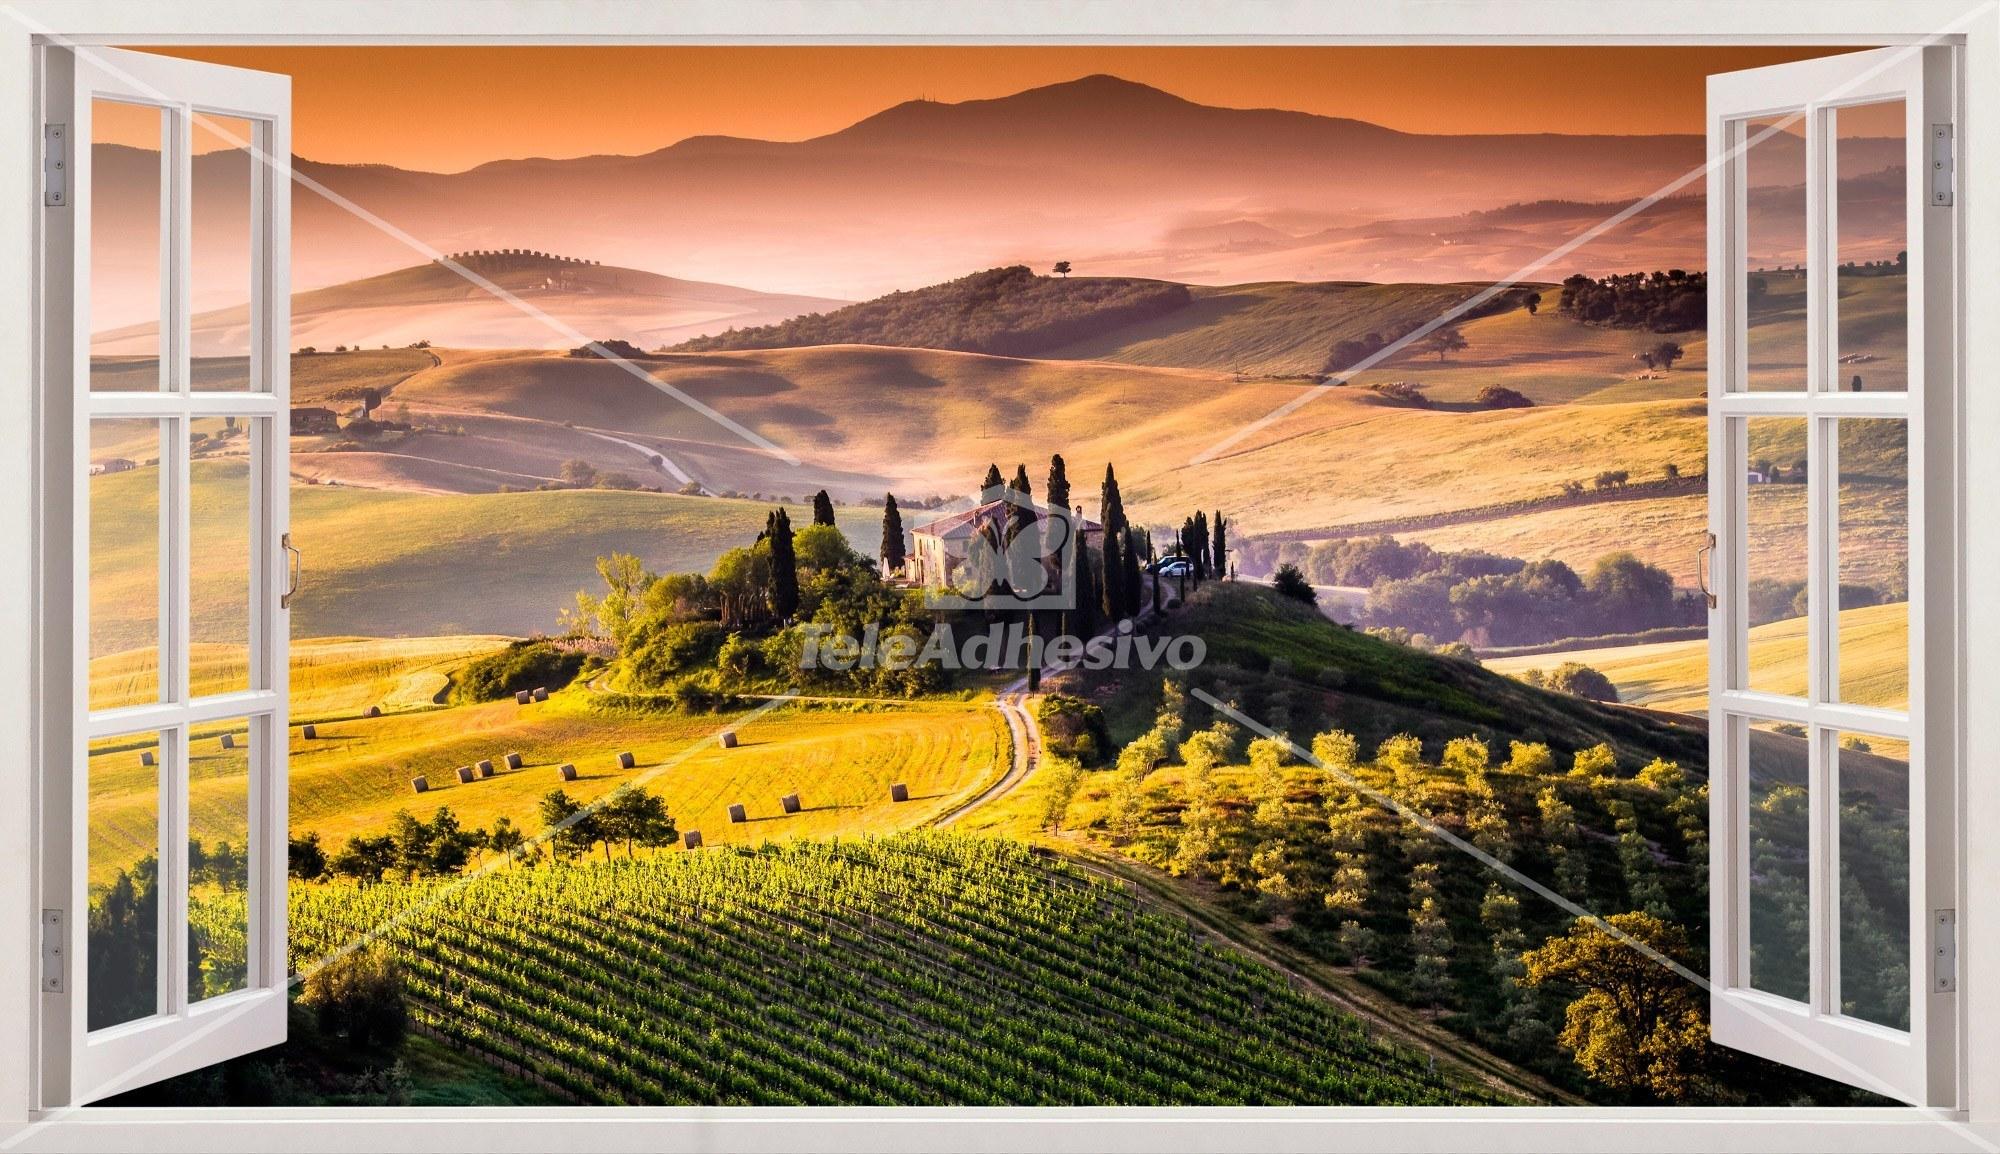 Wandtattoos: Panorama Toskana Italienische Landschaft